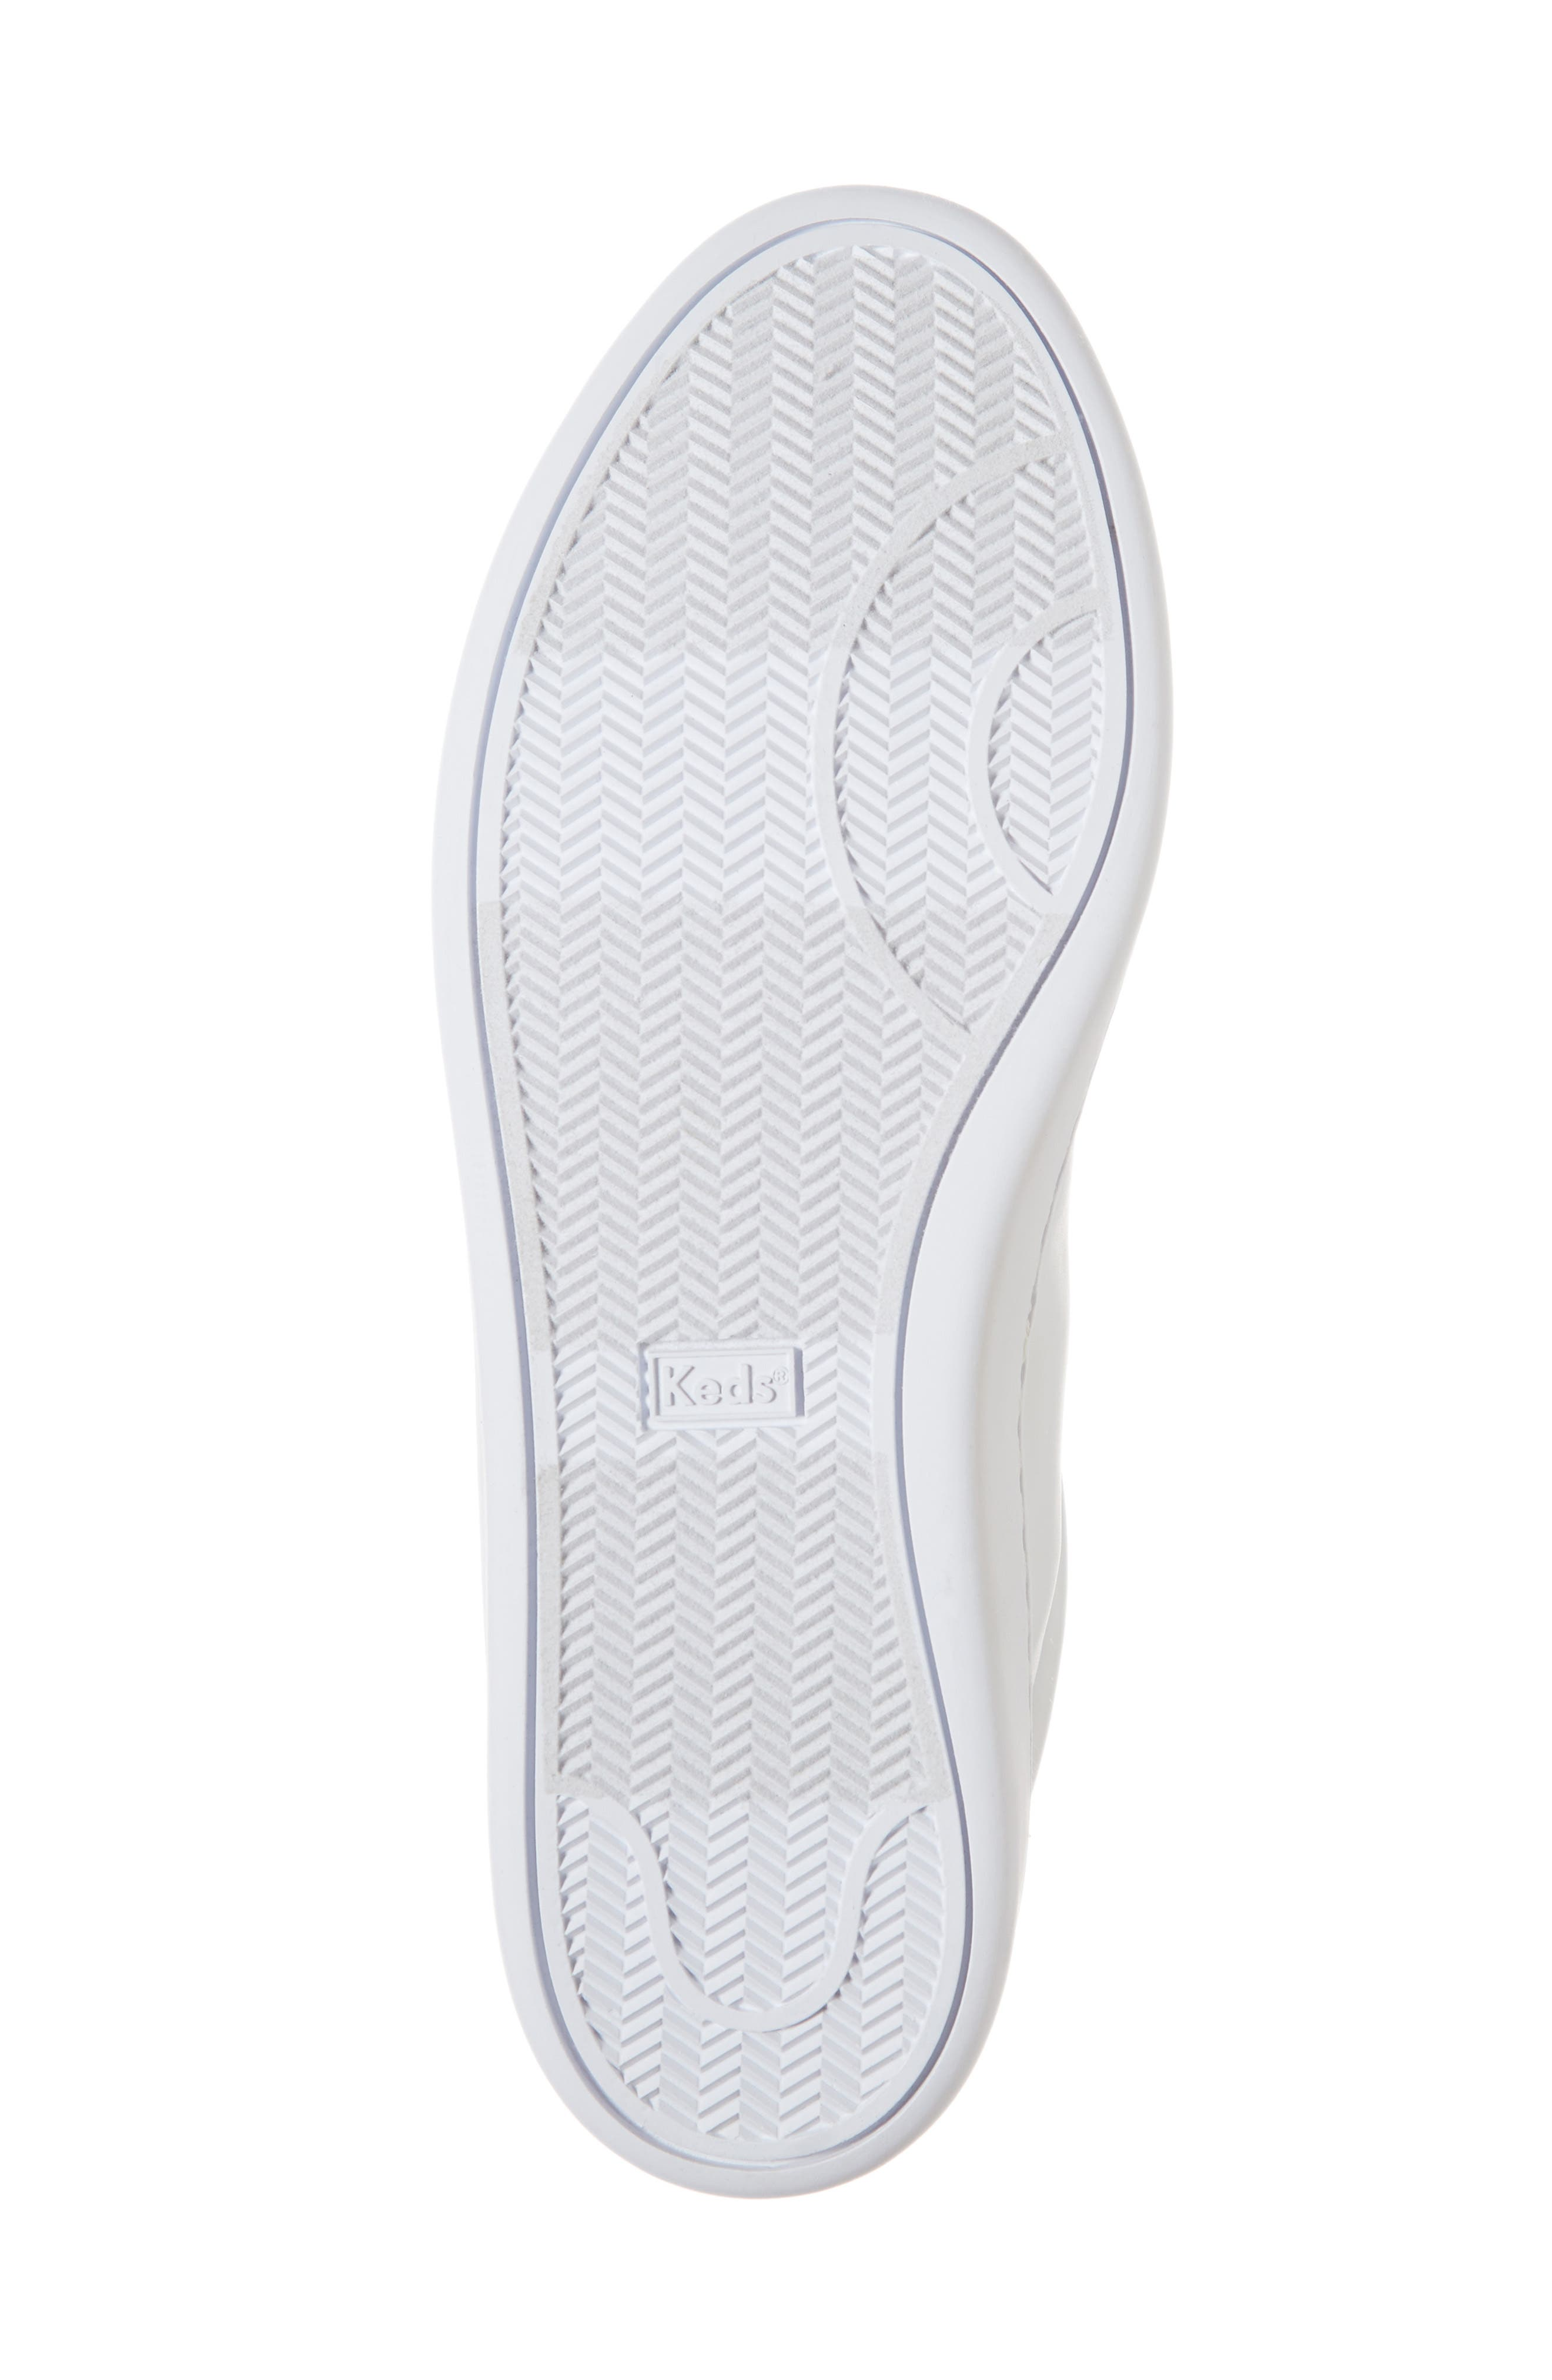 KEDS<SUP>®</SUP>, Ace 3V Sneaker, Alternate thumbnail 6, color, 100